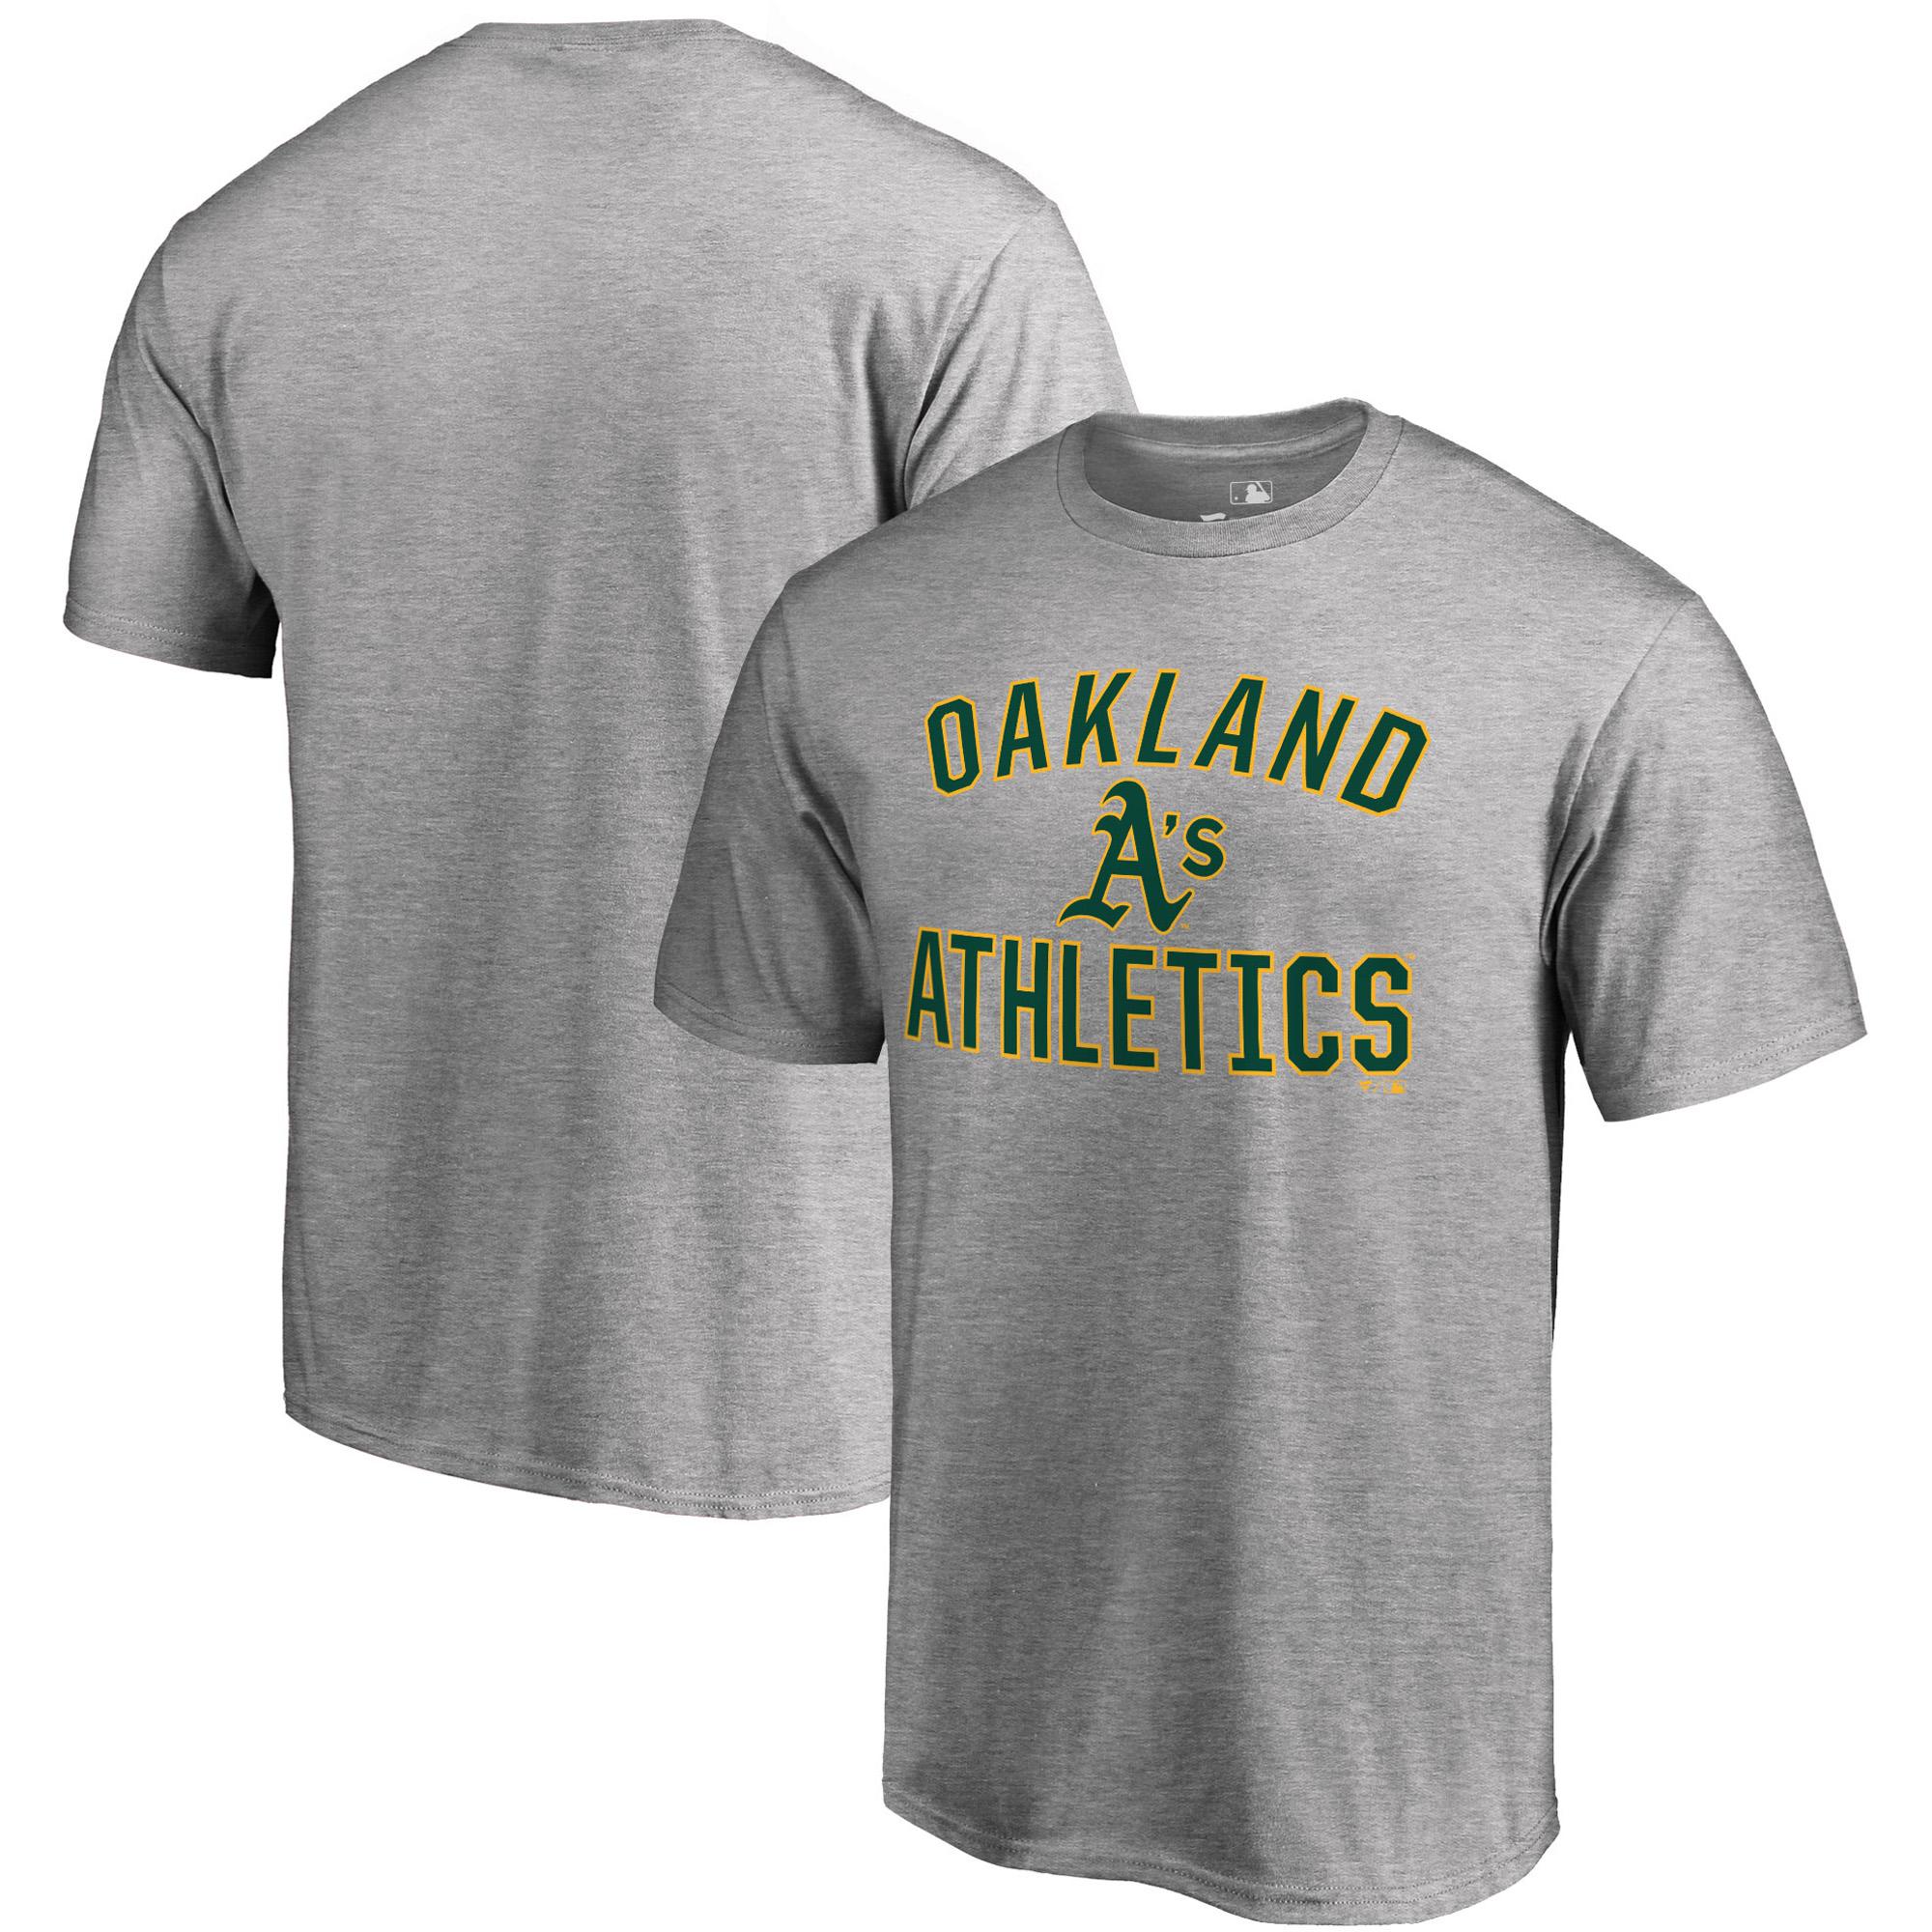 Oakland Athletics Fanatics Branded Victory Arch T-Shirt - Heathered Gray